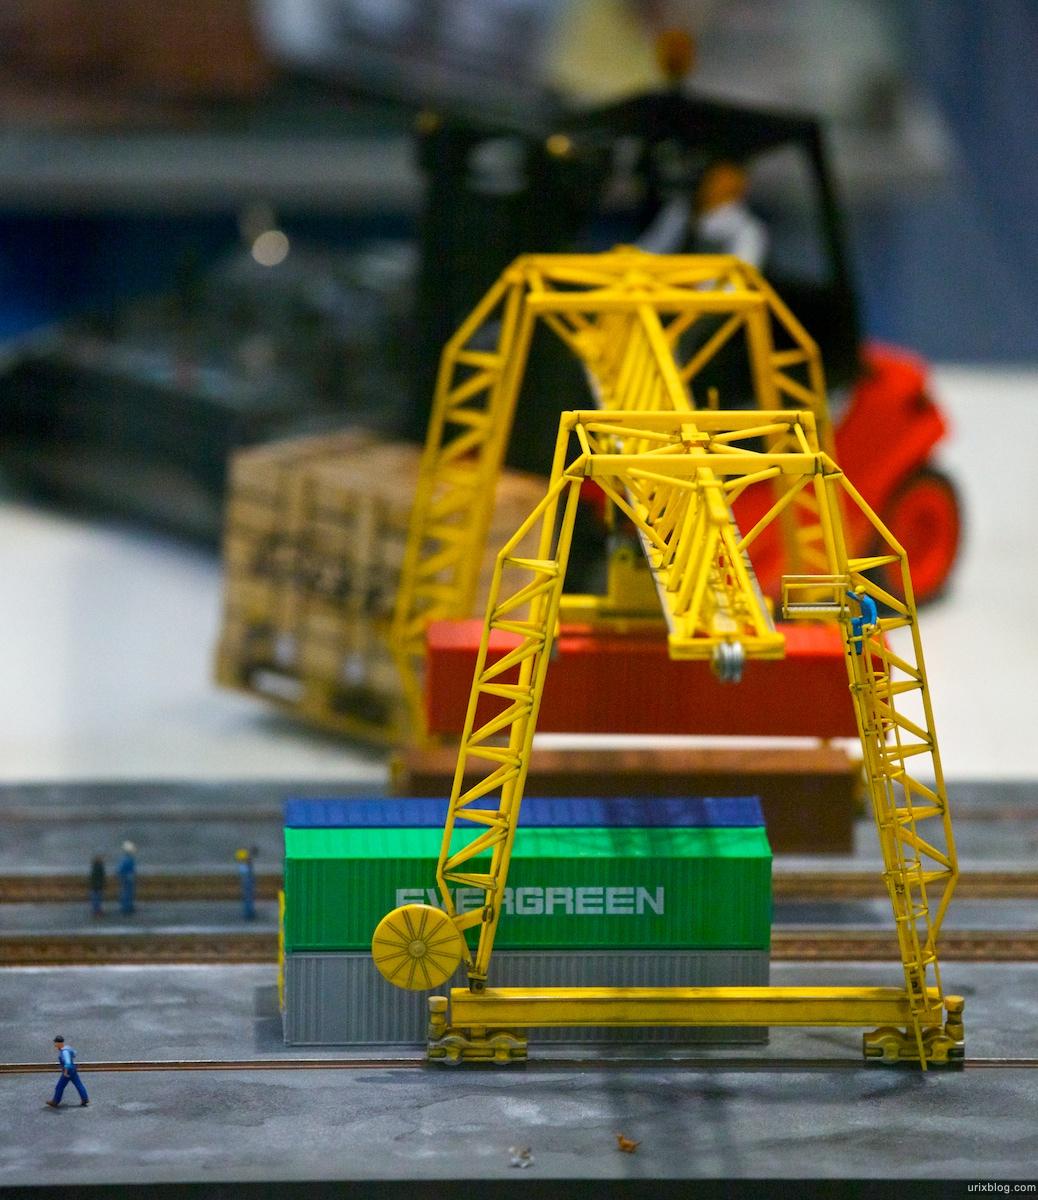 2011 модели scale model Moscow Hobby Expo 2011, Московская Выставка Хобби 2011, Крокус Экспо